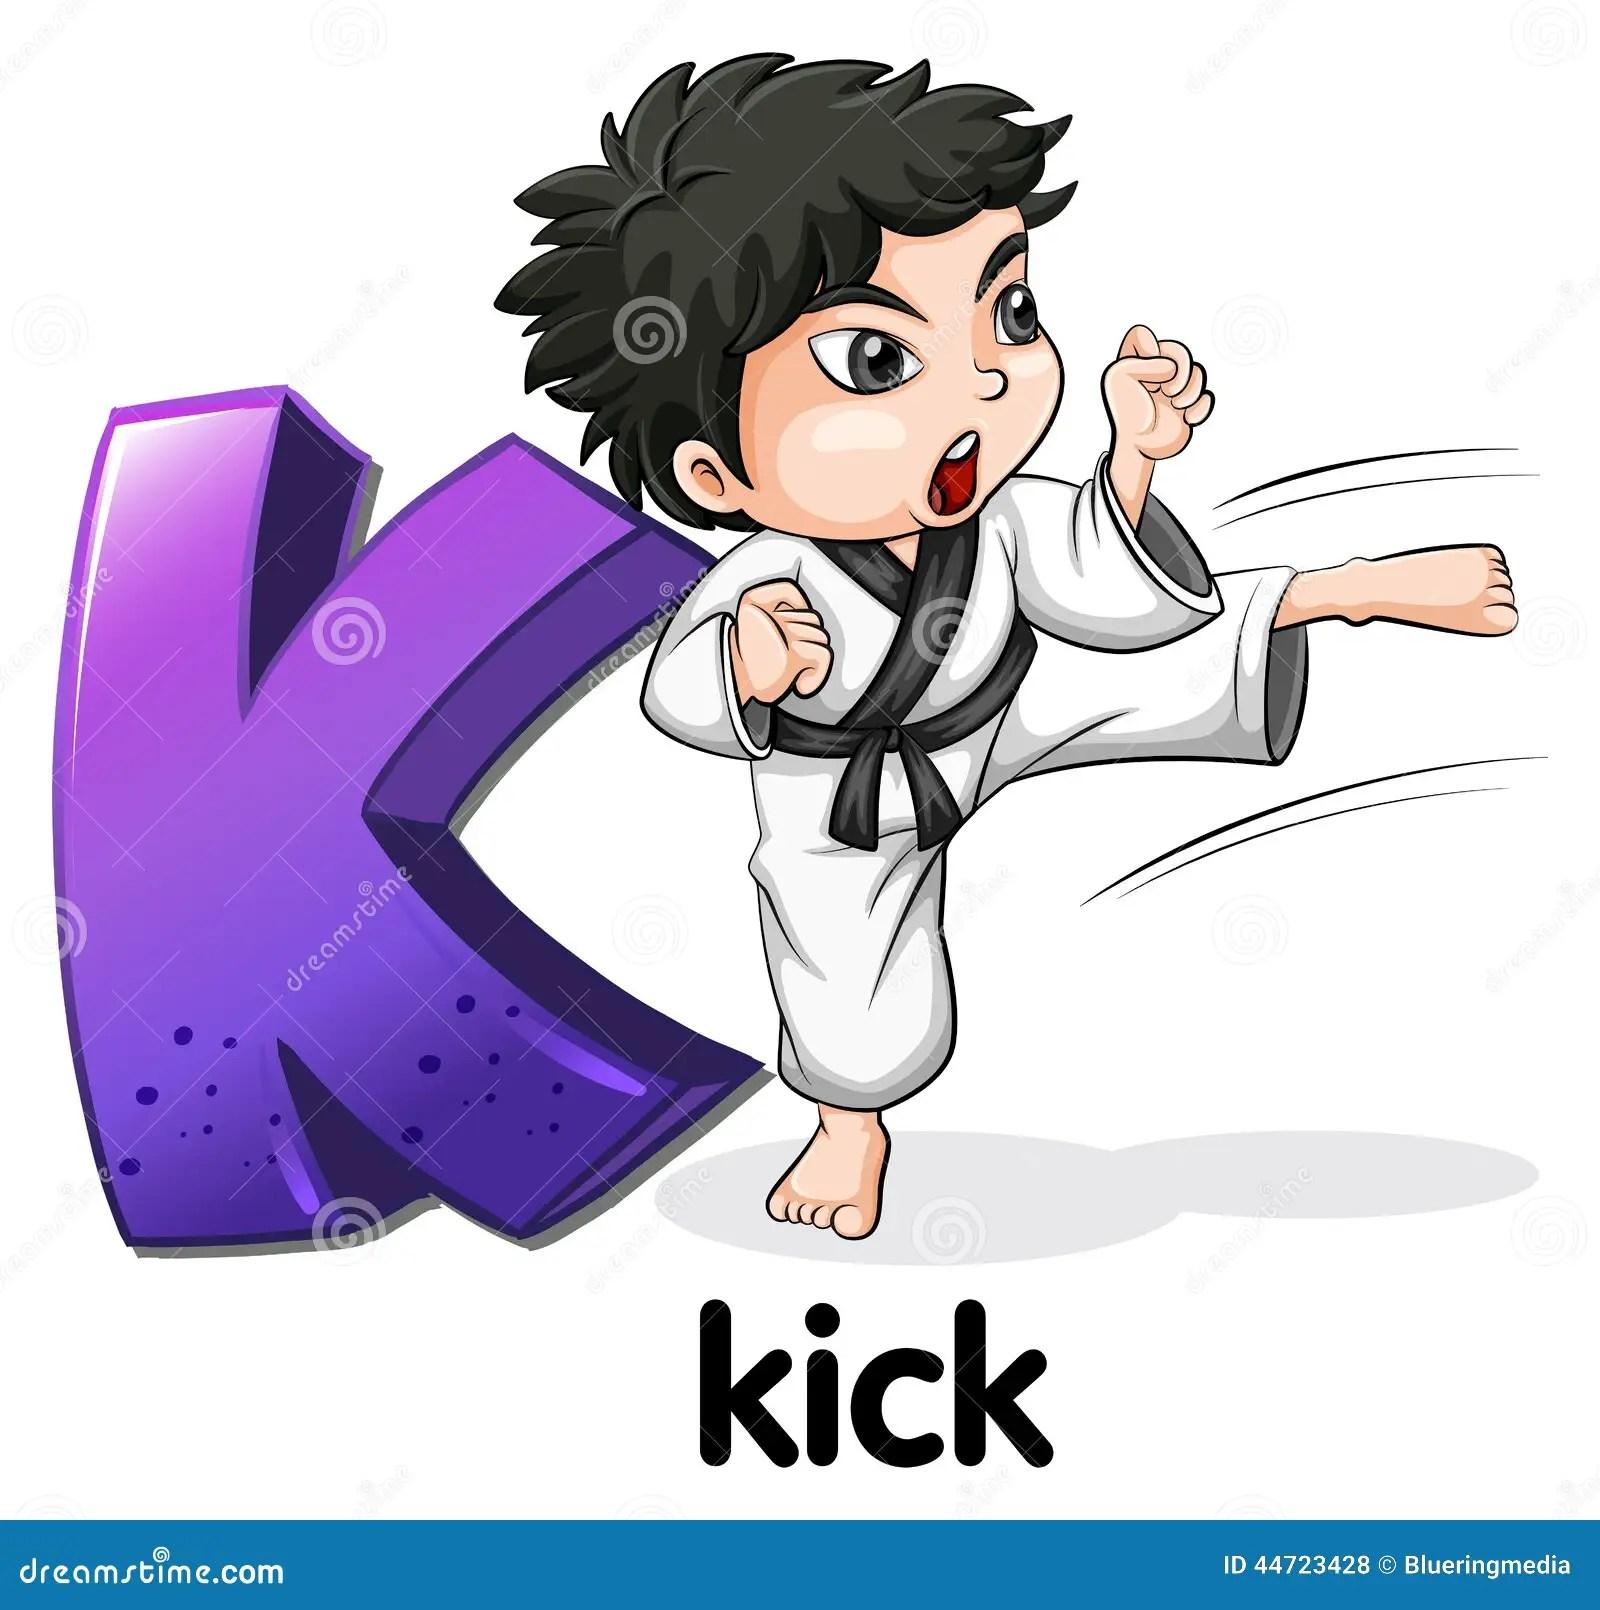 Letter K For Key Kick And Kookaburra Vector Illustration